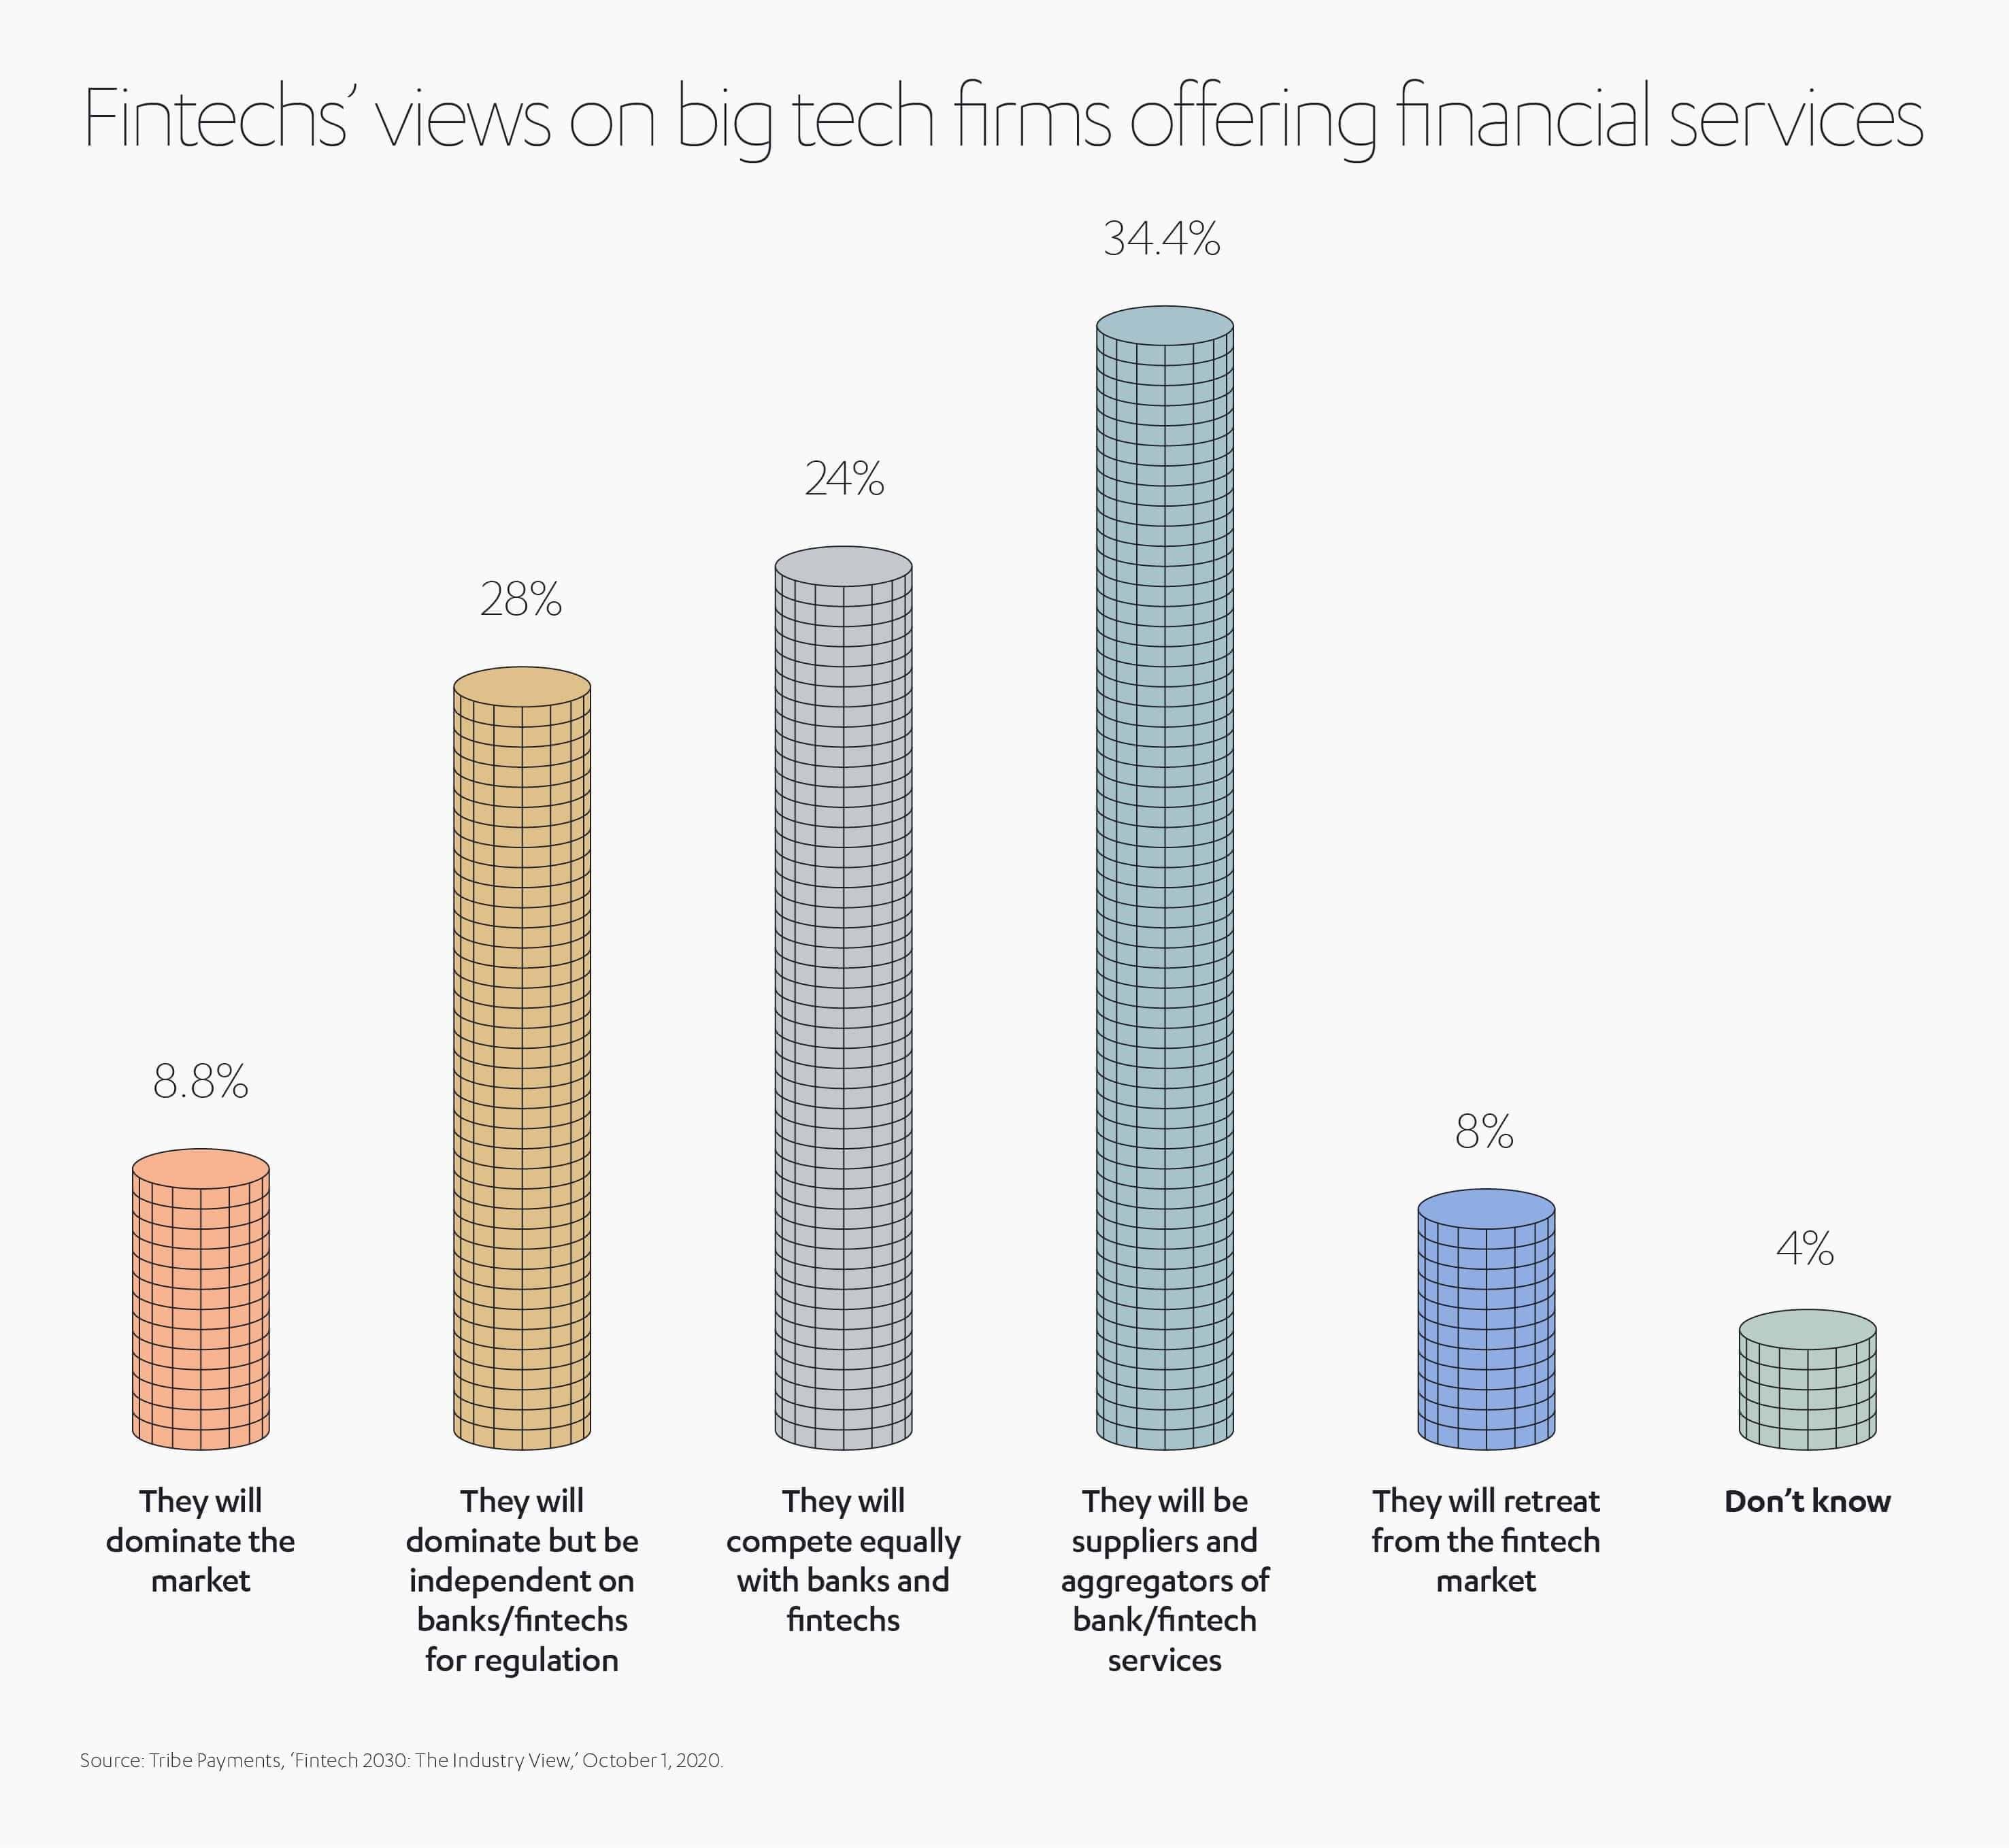 ALJ Financial Services Fintechs Views